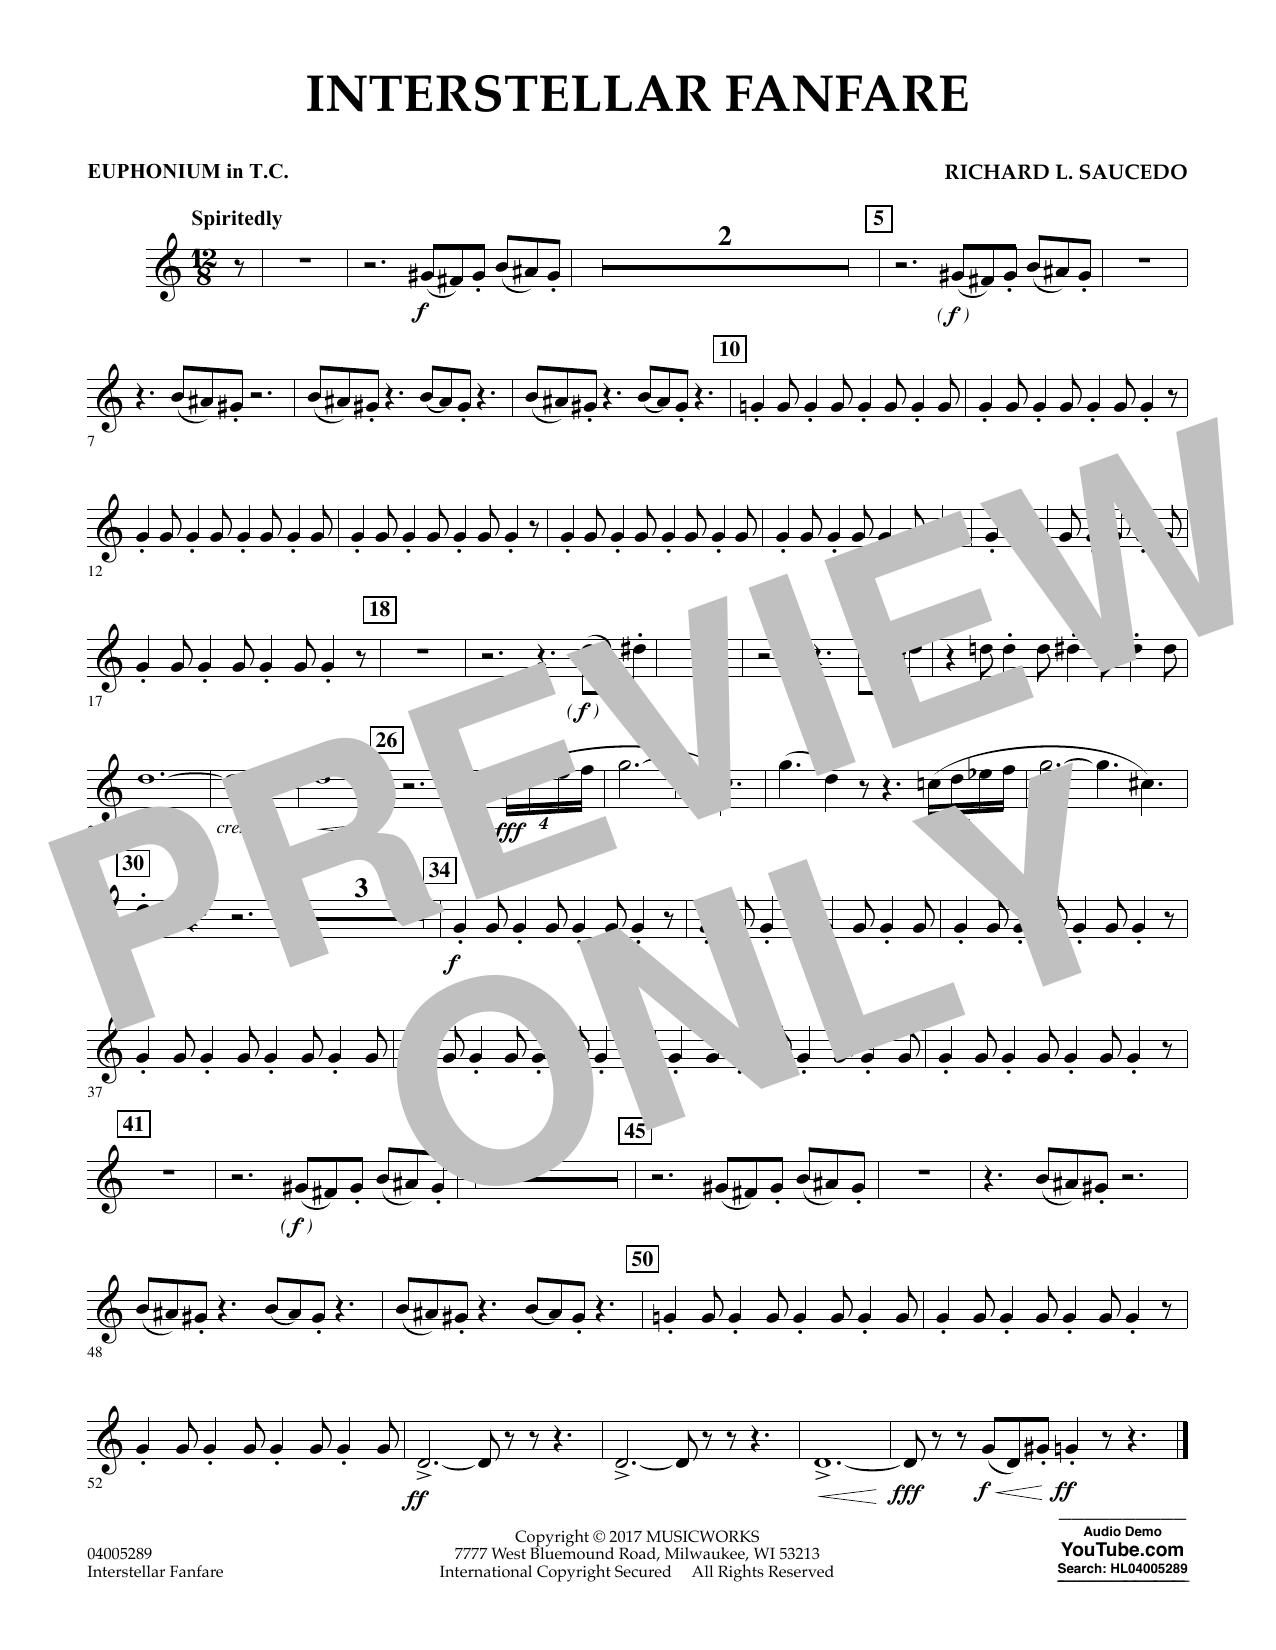 Interstellar Fanfare - Euphonium in Treble Clef (Concert Band)